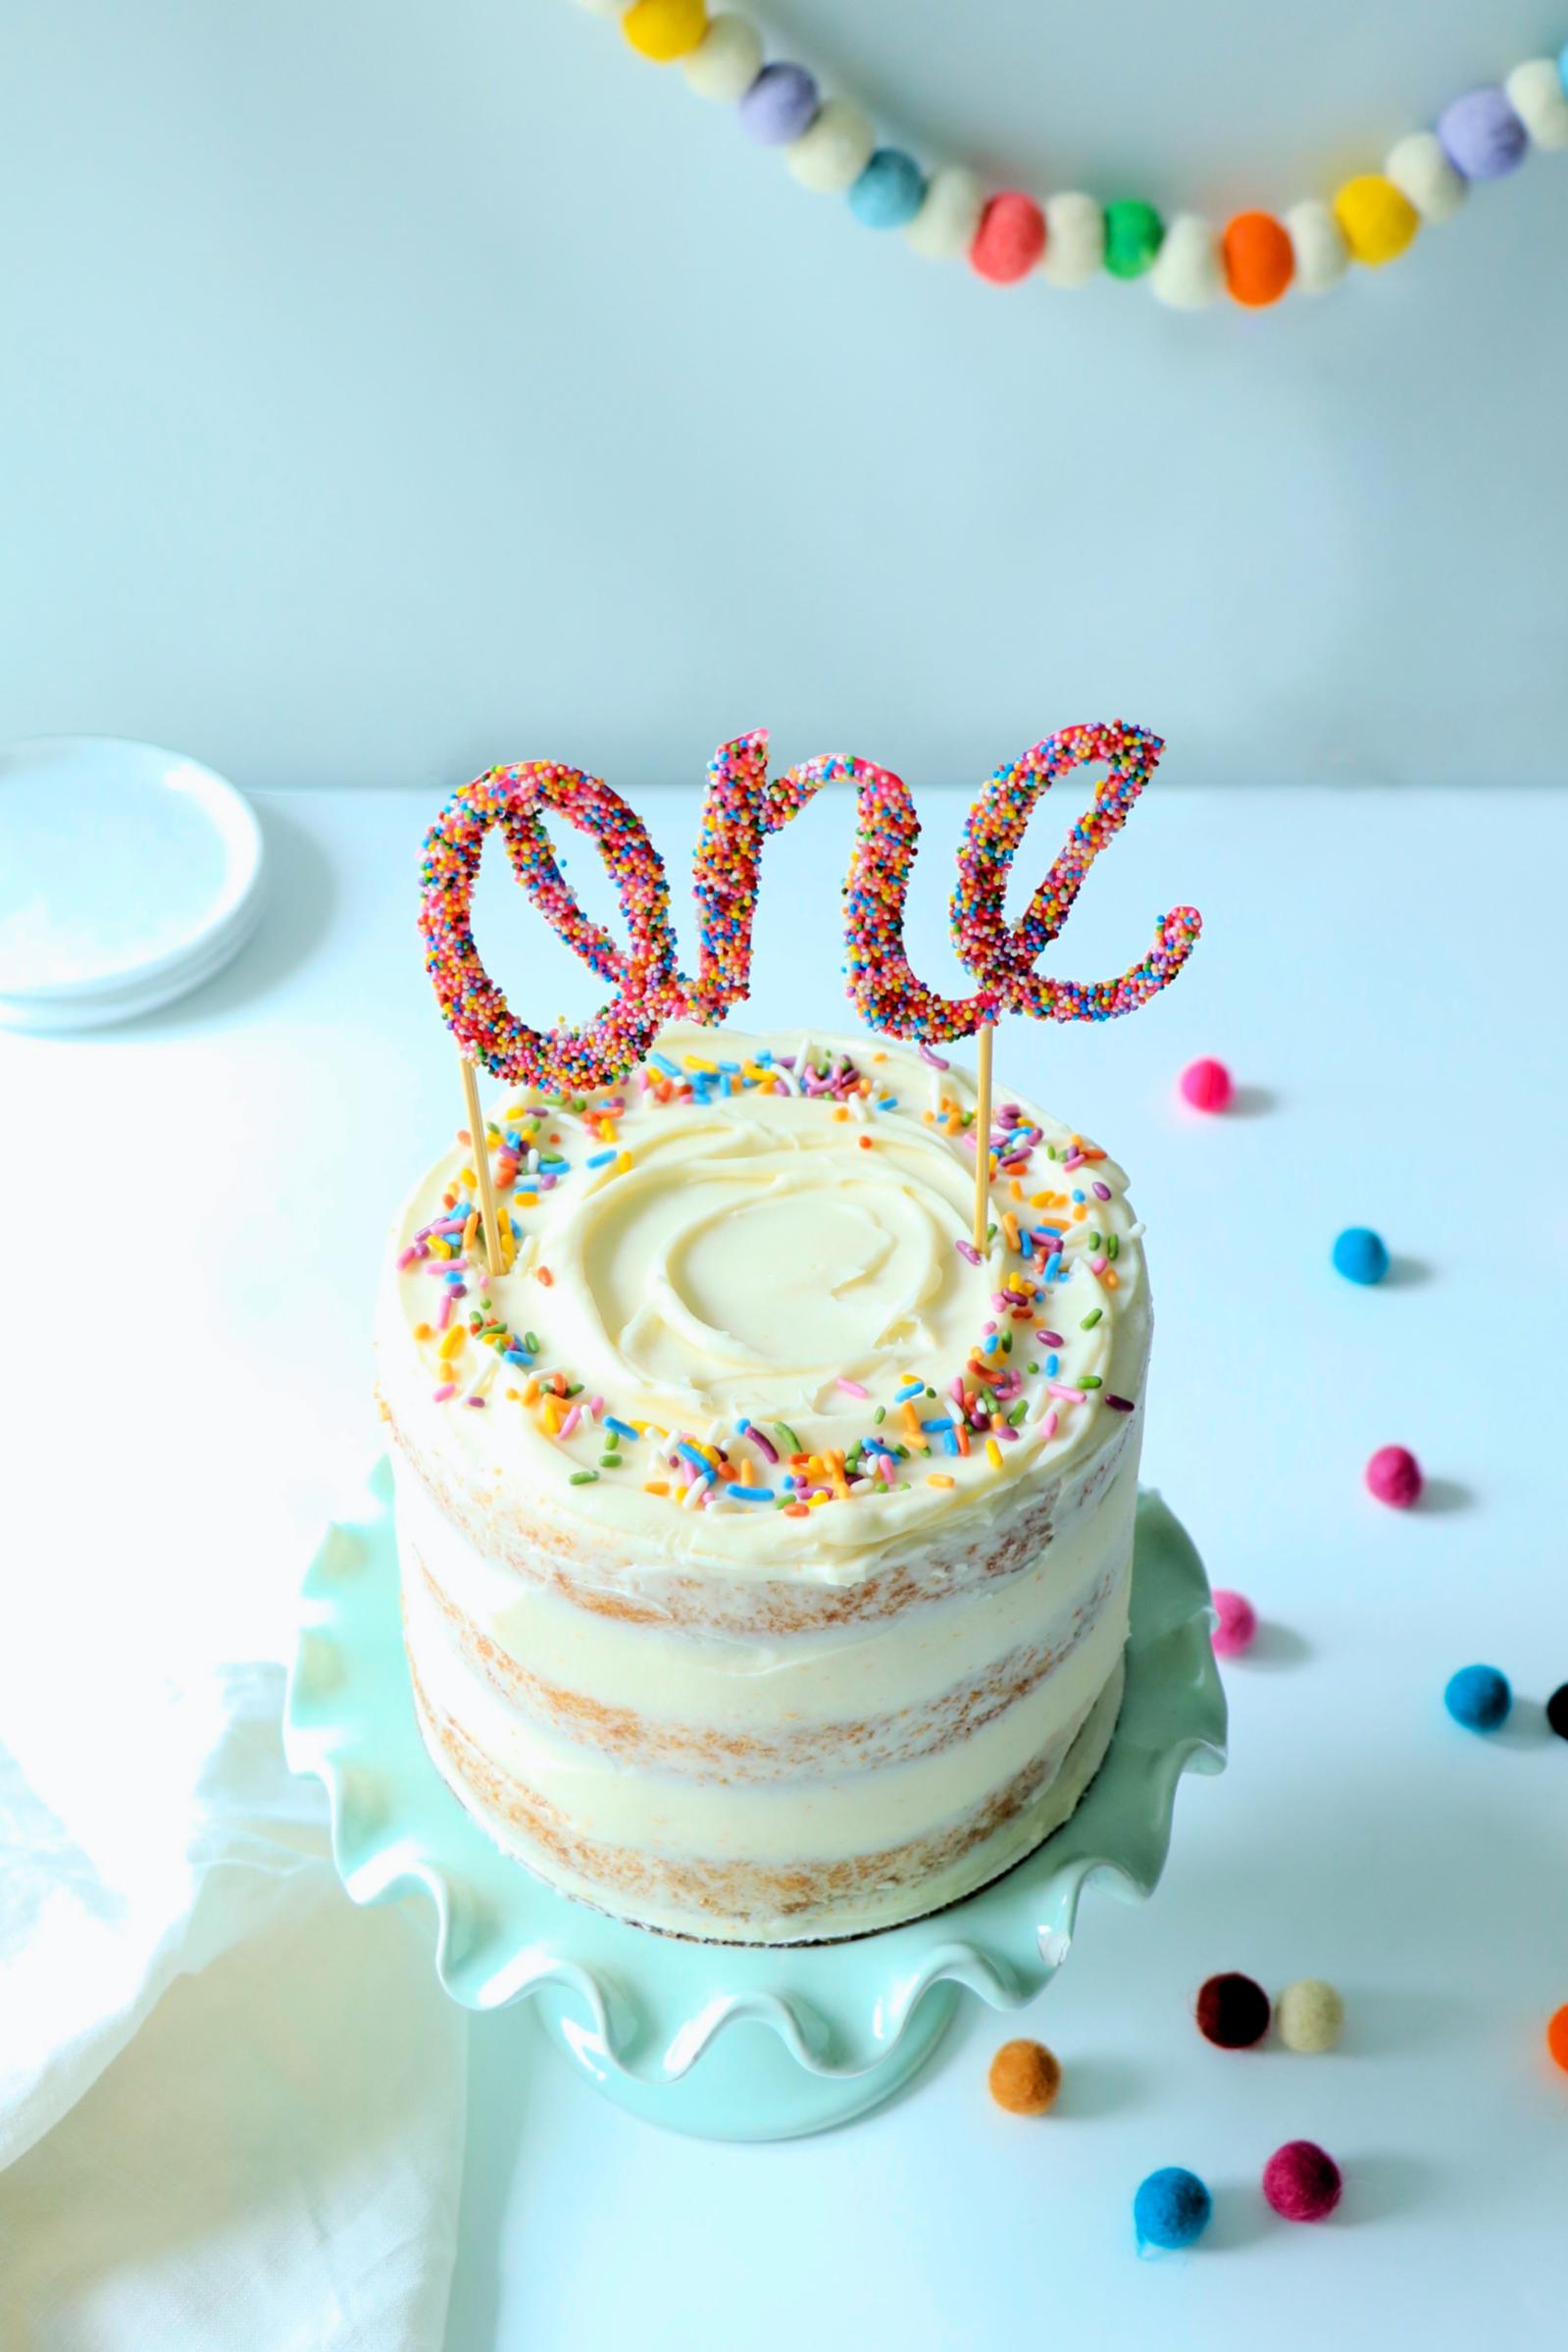 Baby Birthday Cake 1st Birthday Cake Poppikit Cake Kits 1st Baby Birthday Cake Kits Poppik Baby Birthday Cakes Homemade Smash Cake 1st Birthday Cakes